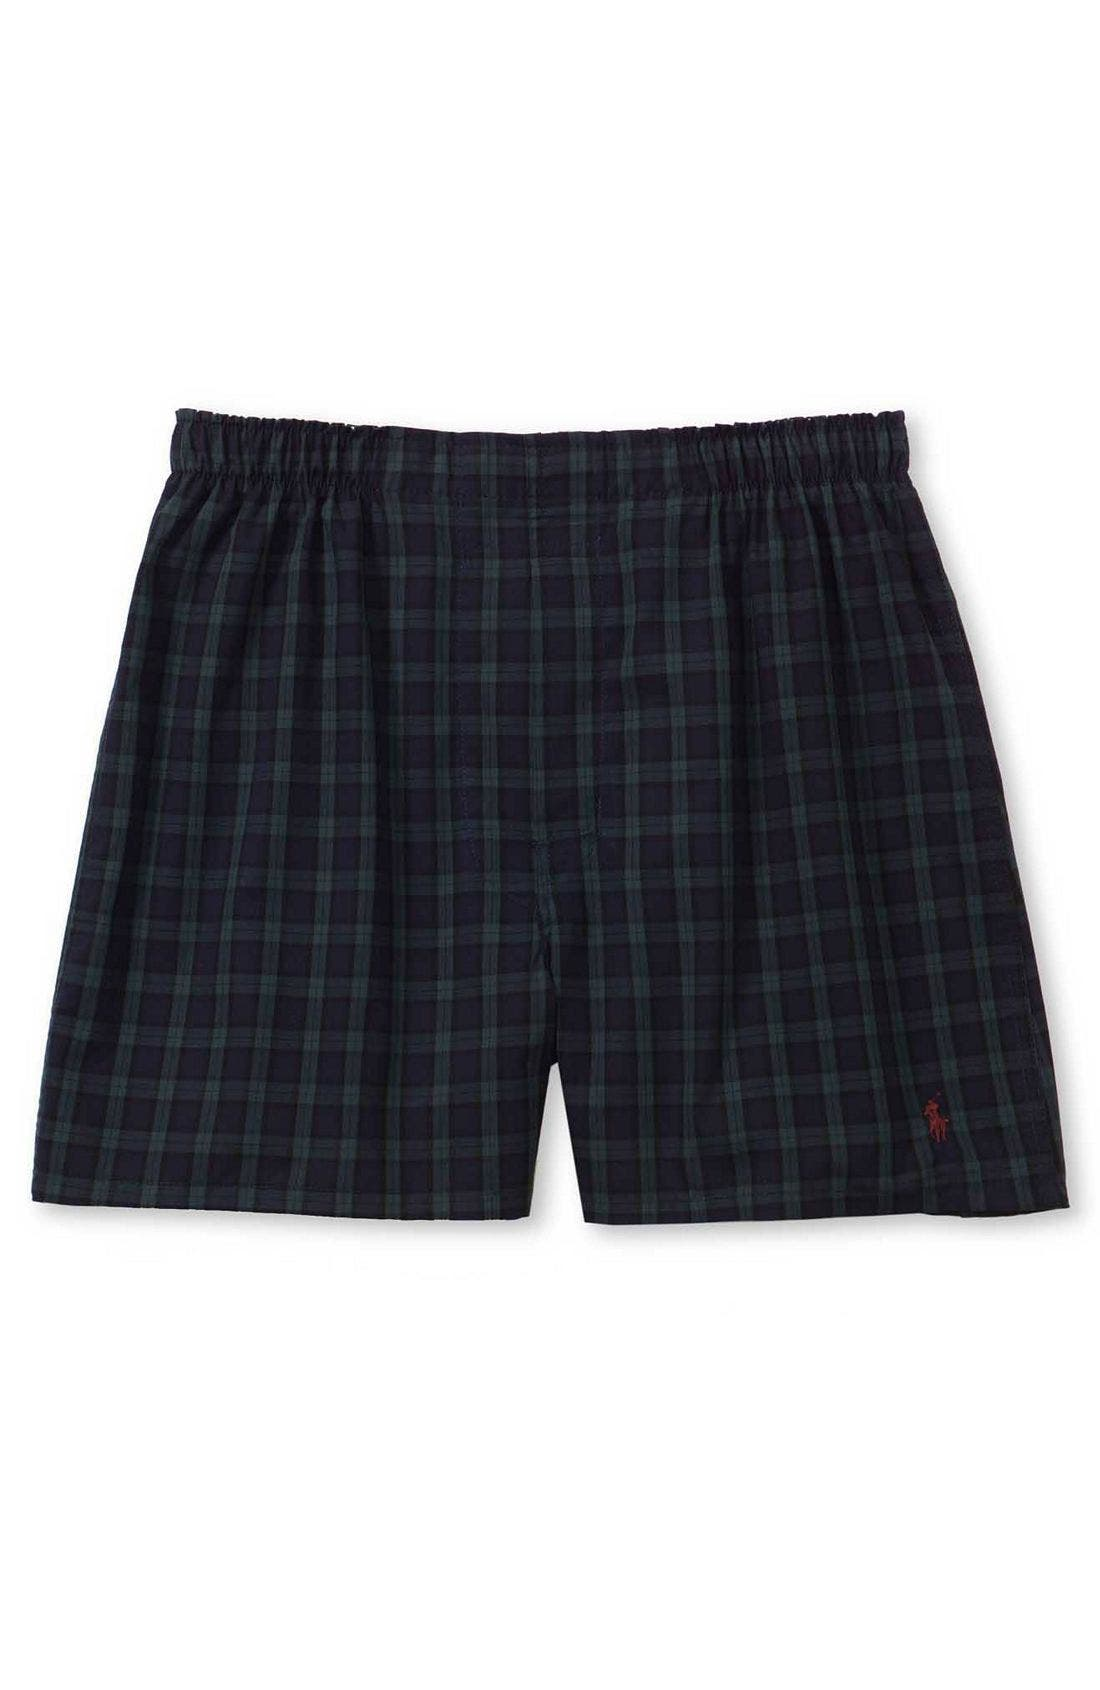 Plaid Woven Boxer Shorts,                             Main thumbnail 1, color,                             Blackwatch